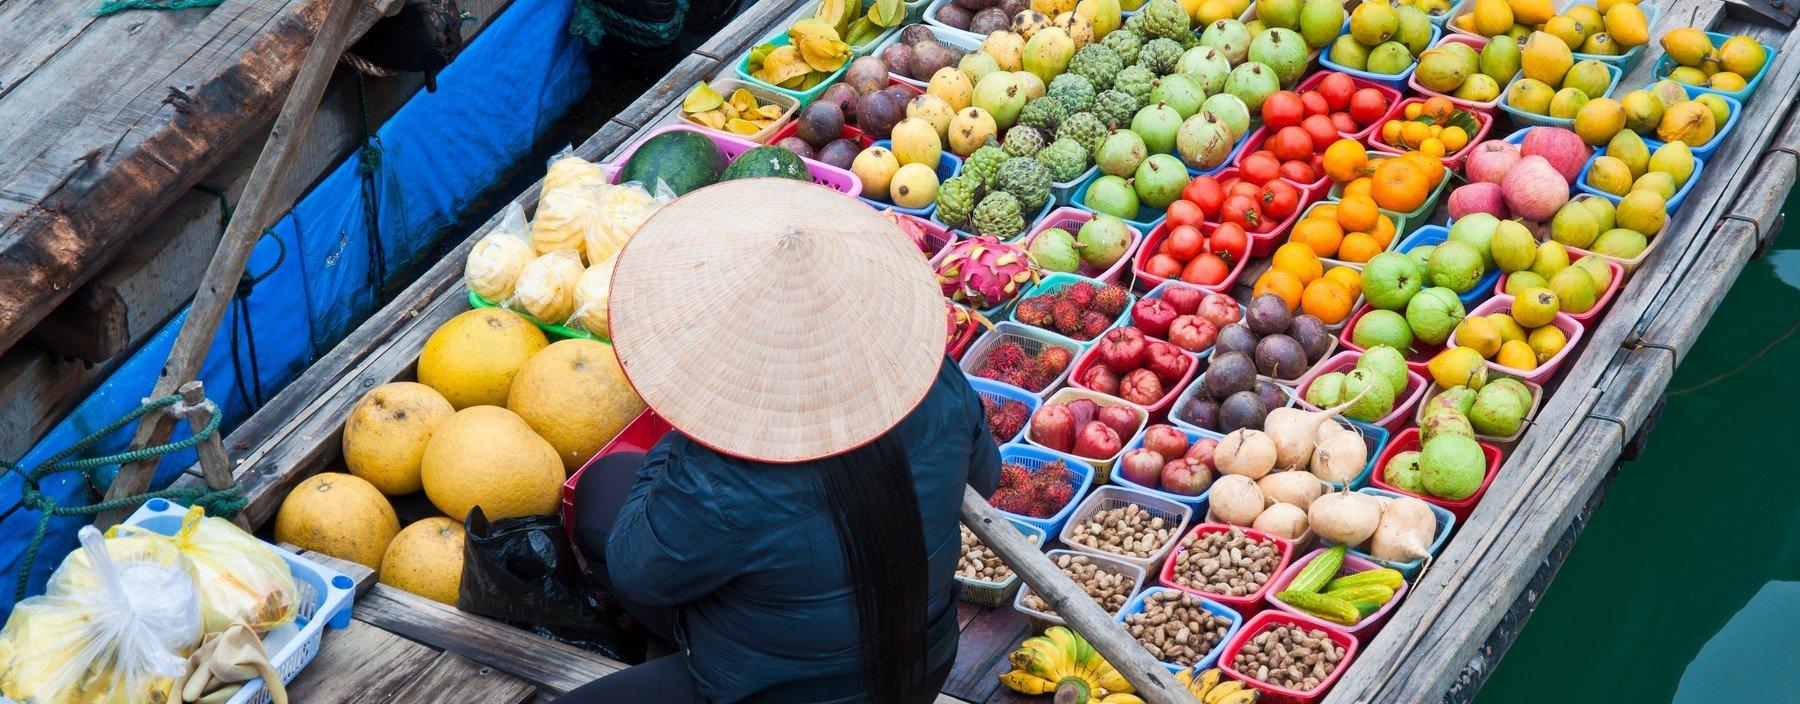 vn, mekong delta, floating market (18).jpg